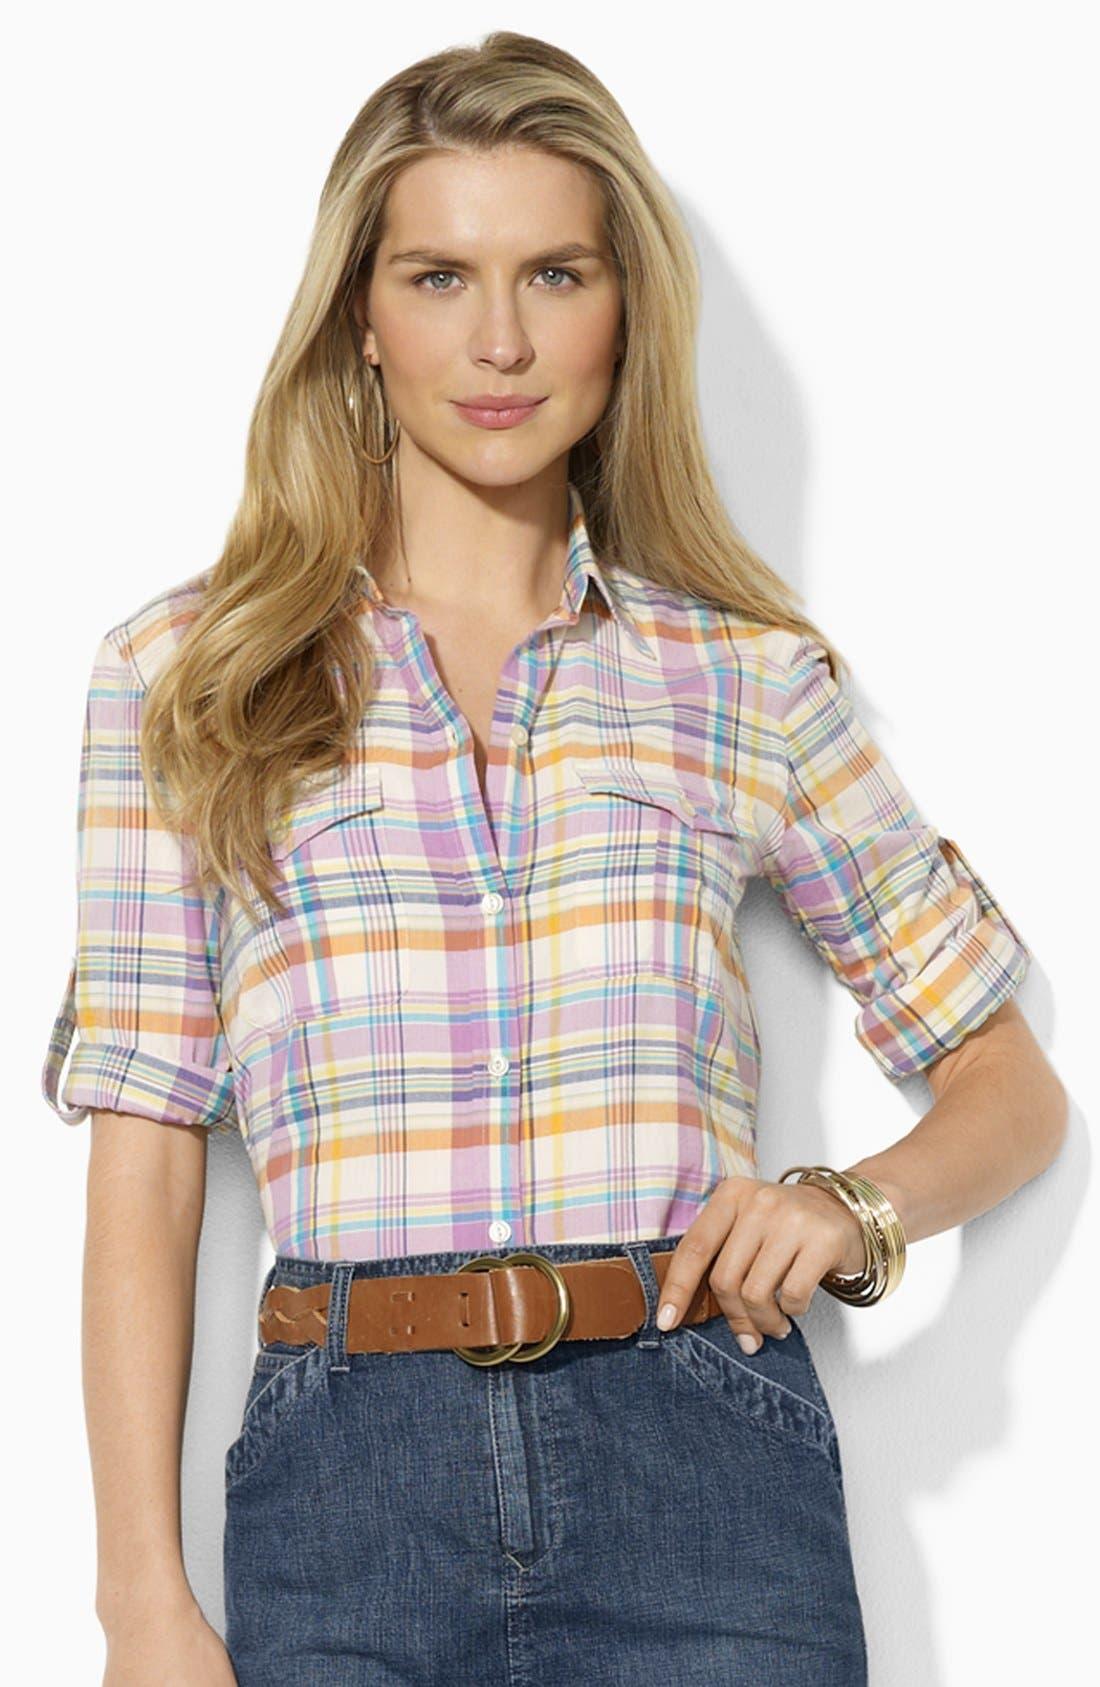 Alternate Image 1 Selected - Lauren Ralph Lauren Fitted Plaid Shirt (Petite) (Online Only)